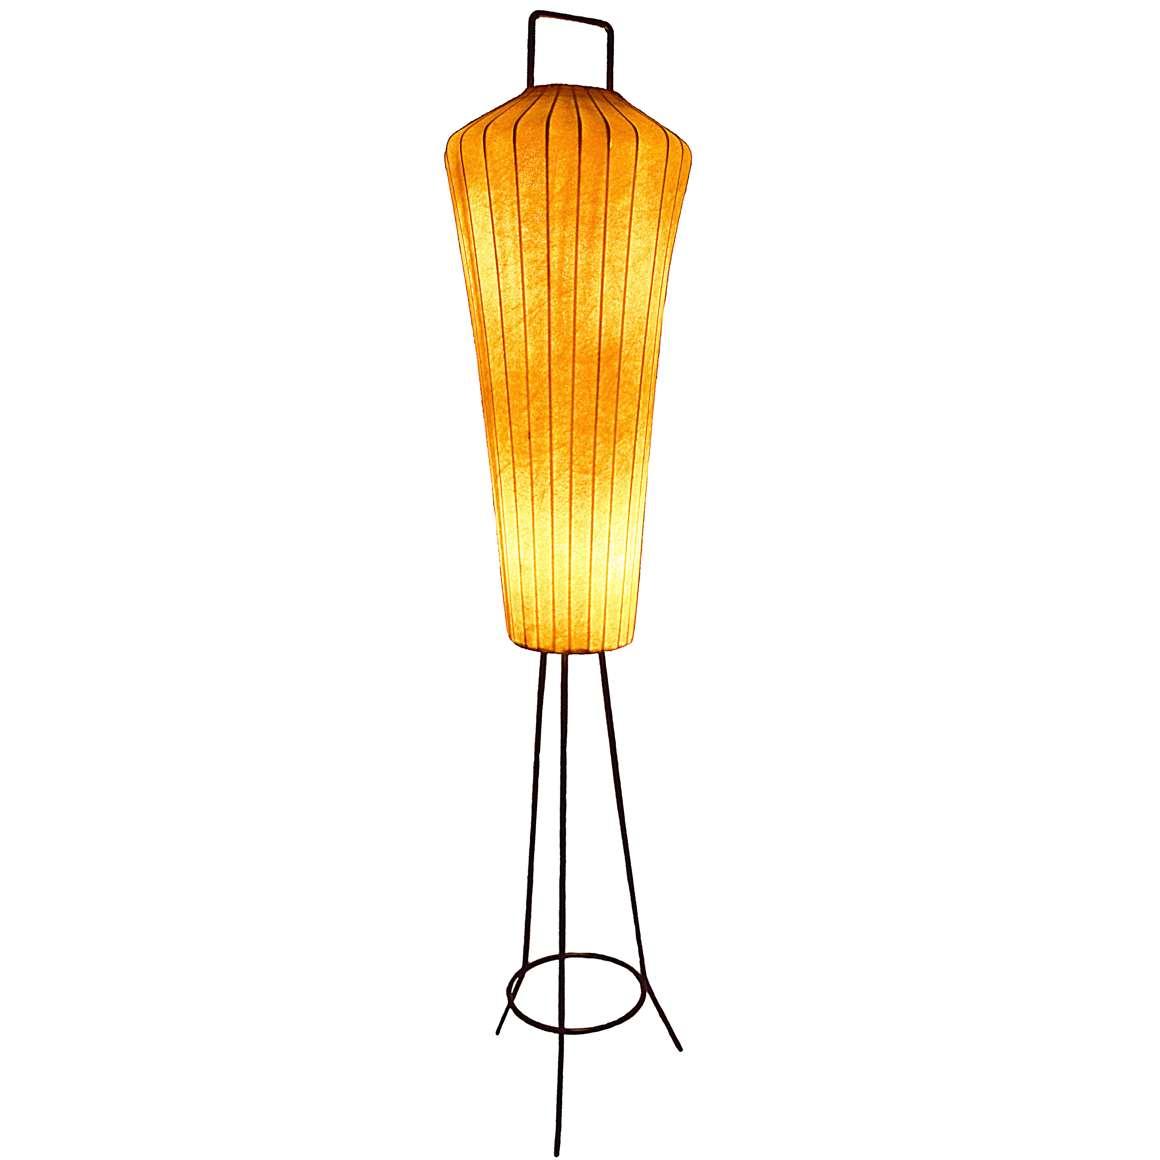 Artimeta Lugano Tripod Cocoon Floor Lamp